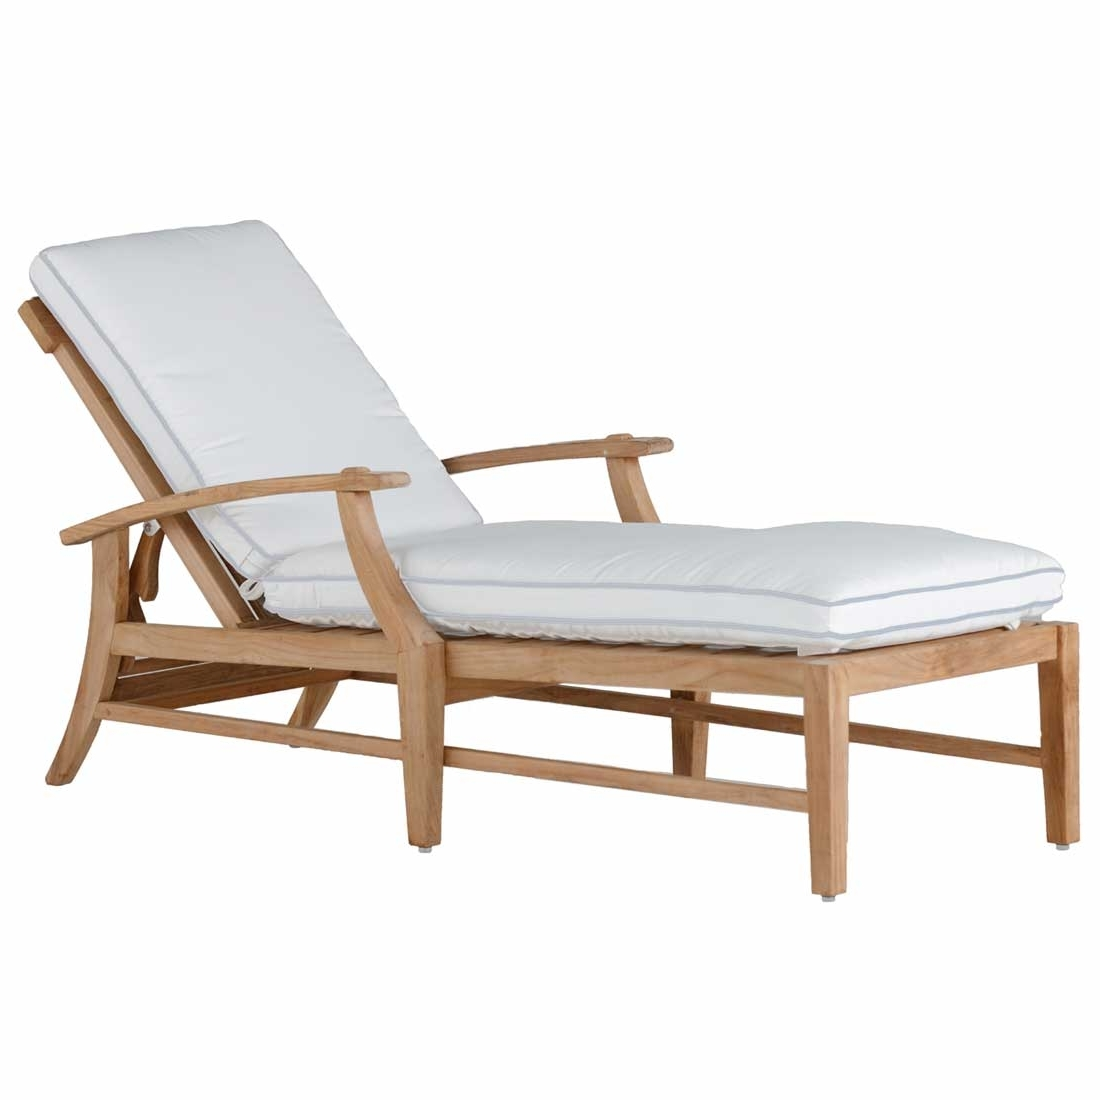 Croquet Teak Chaise – Summer Classics Regarding Newest Teak Chaise Lounges (View 5 of 15)